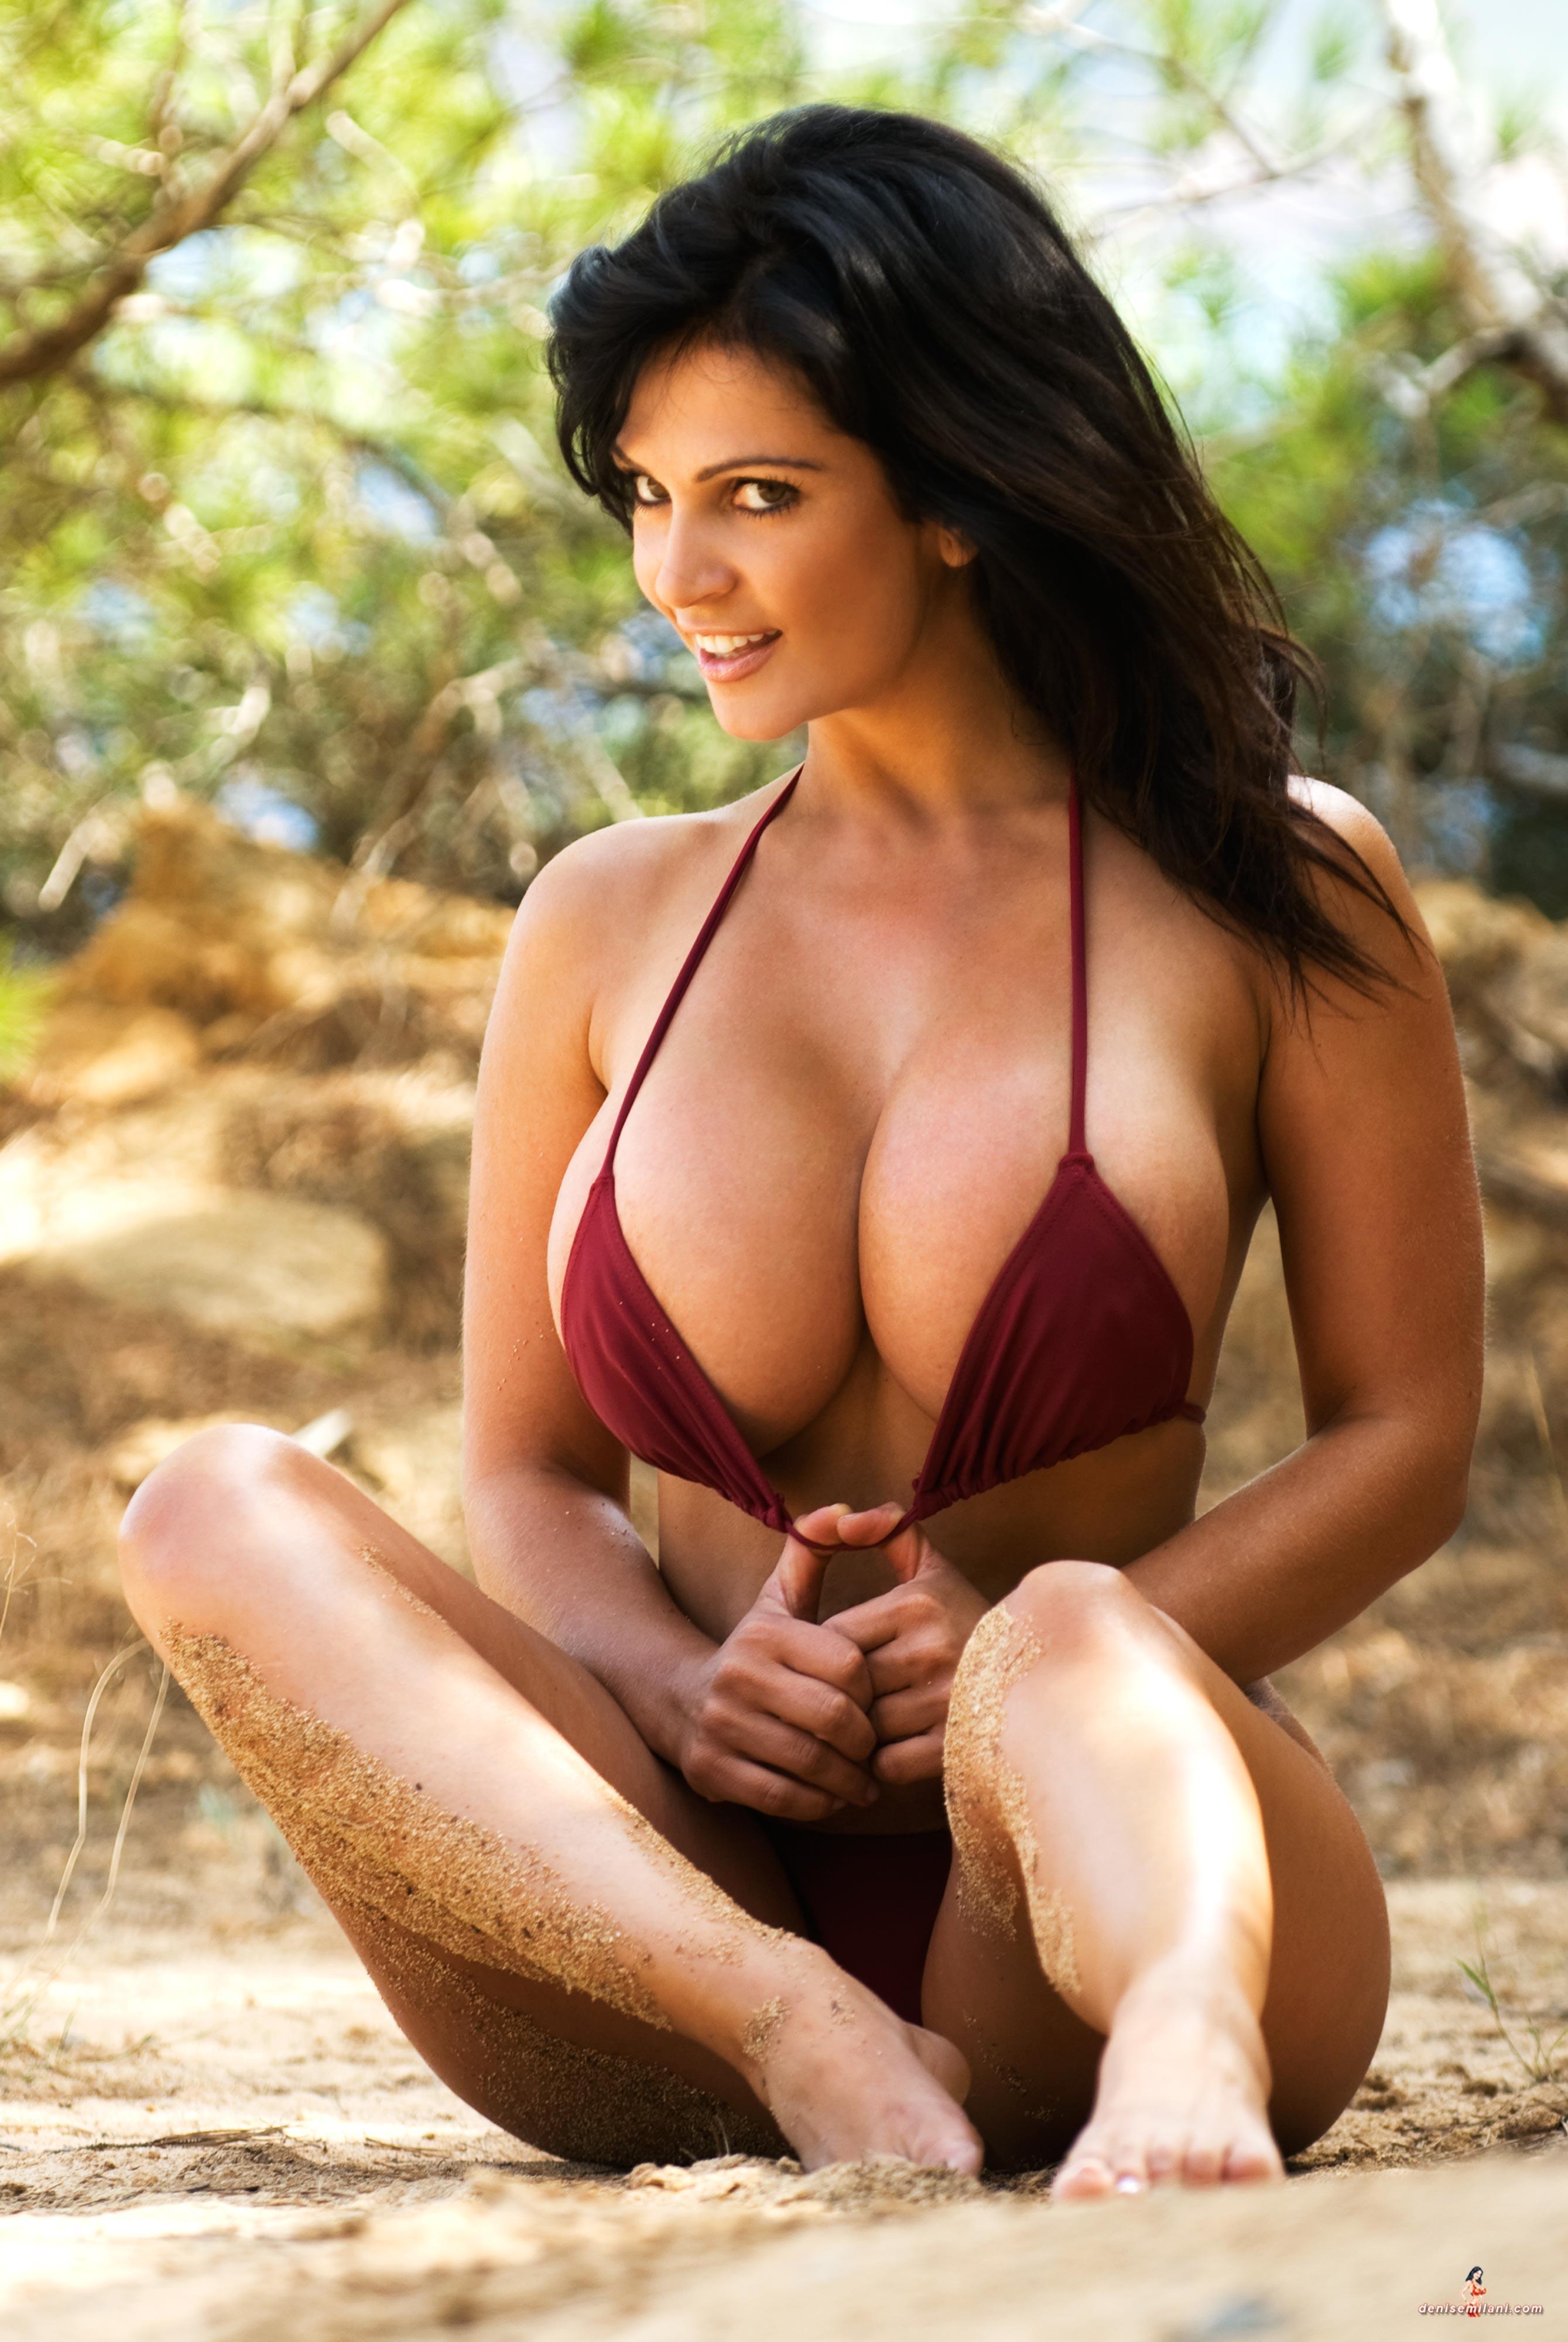 Hot Busty Babe